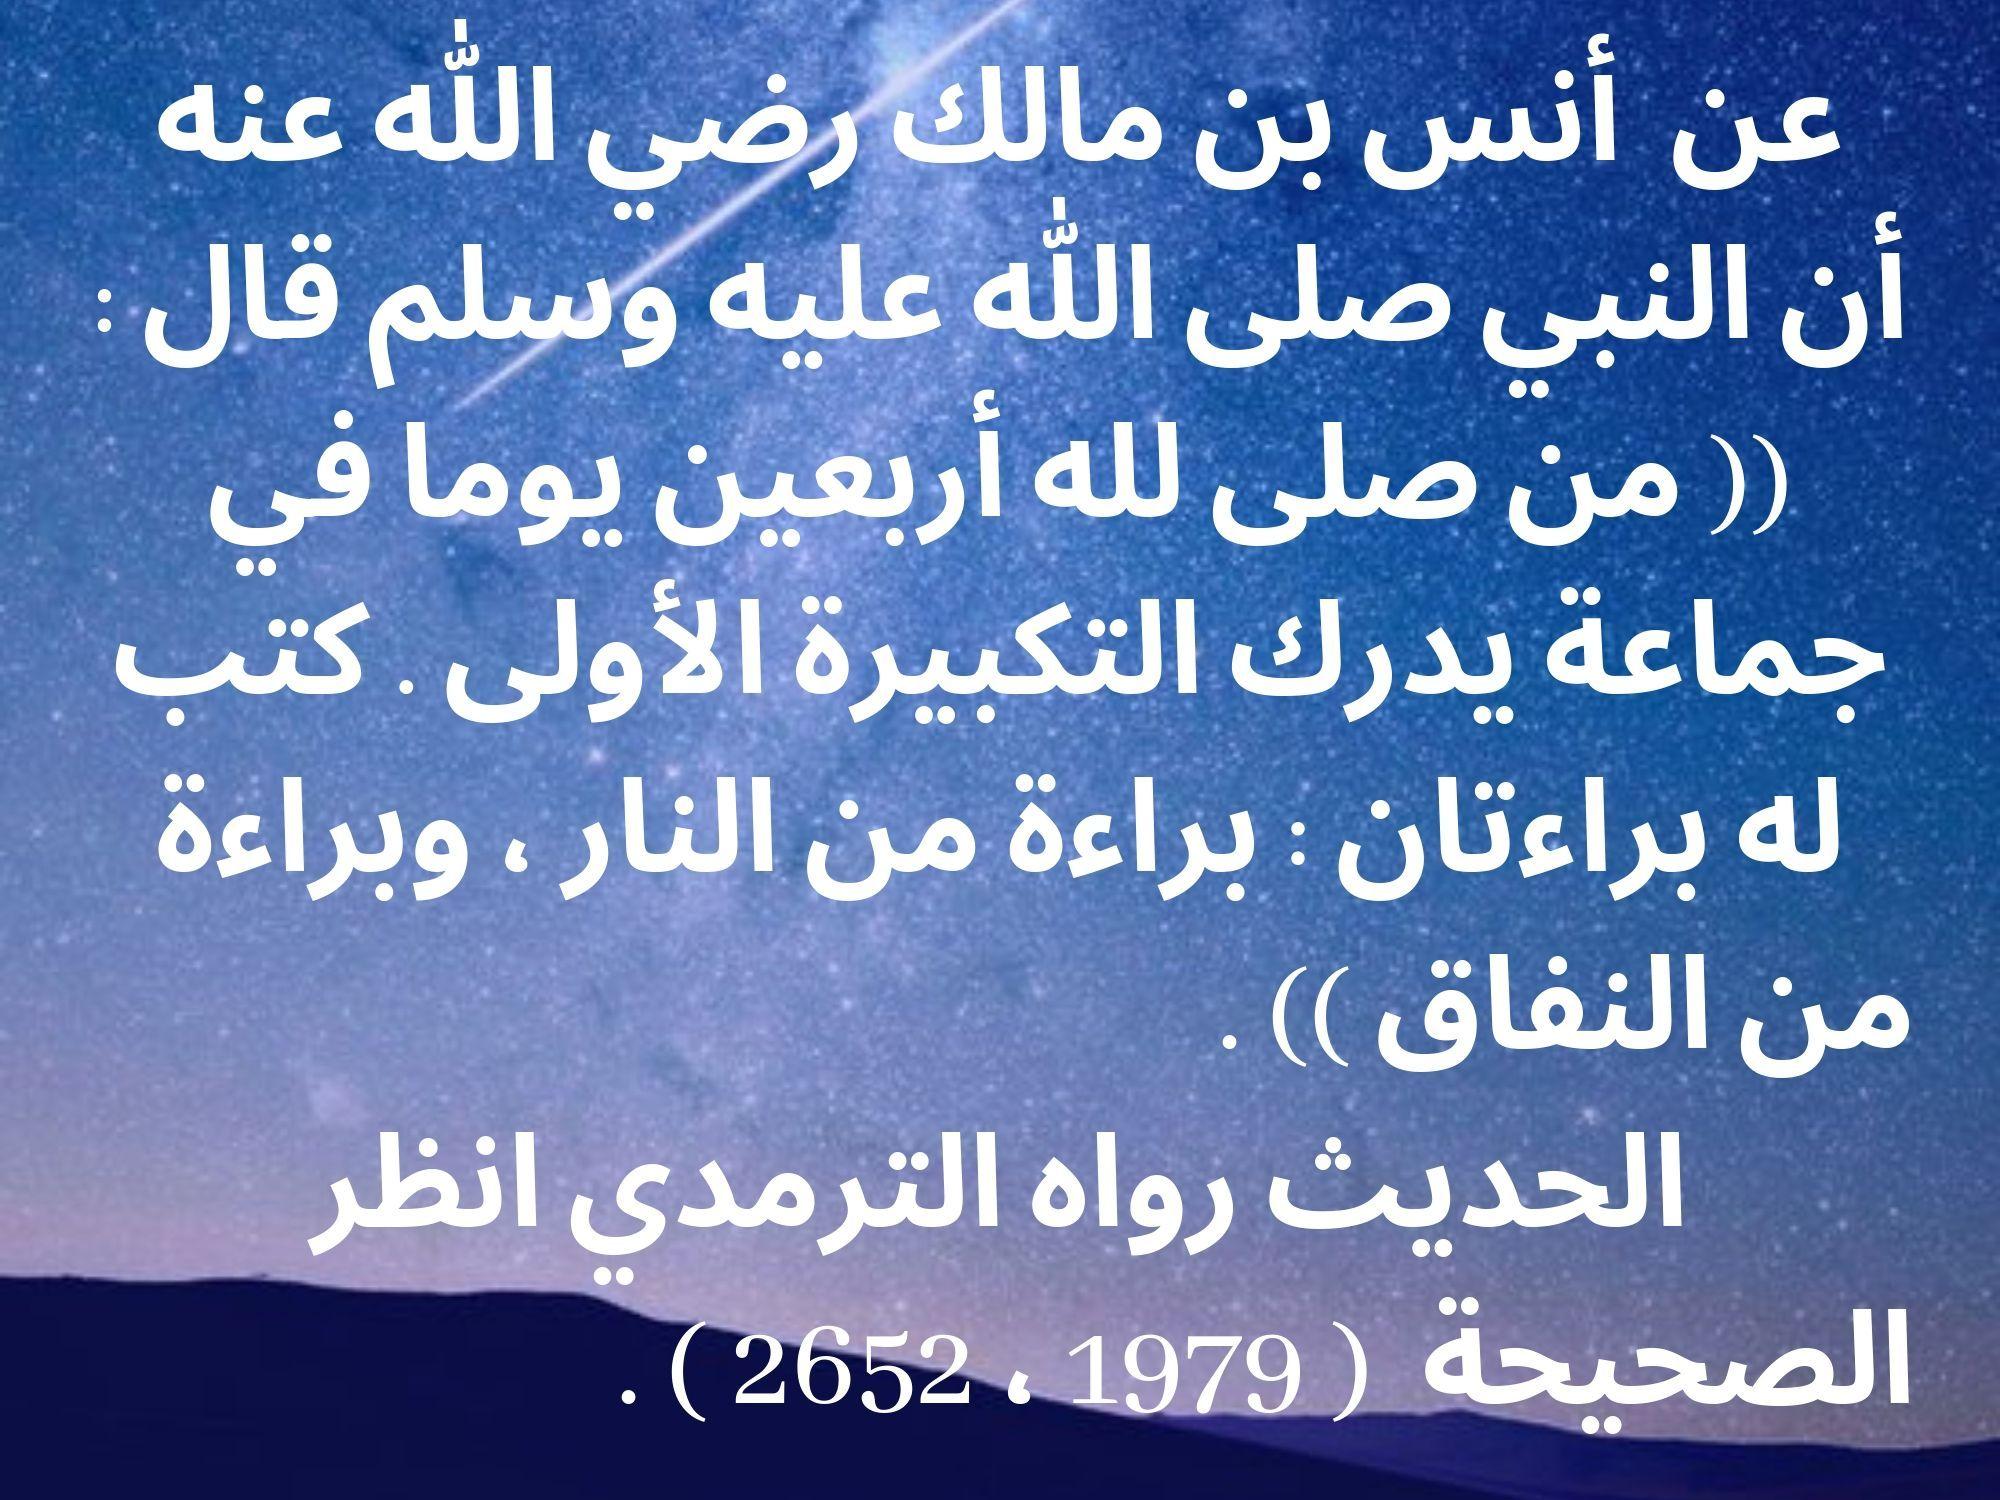 Pin By الدعوة إلى الله On أحديث نبوية شريفة عن فضل الصلاة في المسجد Arabic Calligraphy Calligraphy